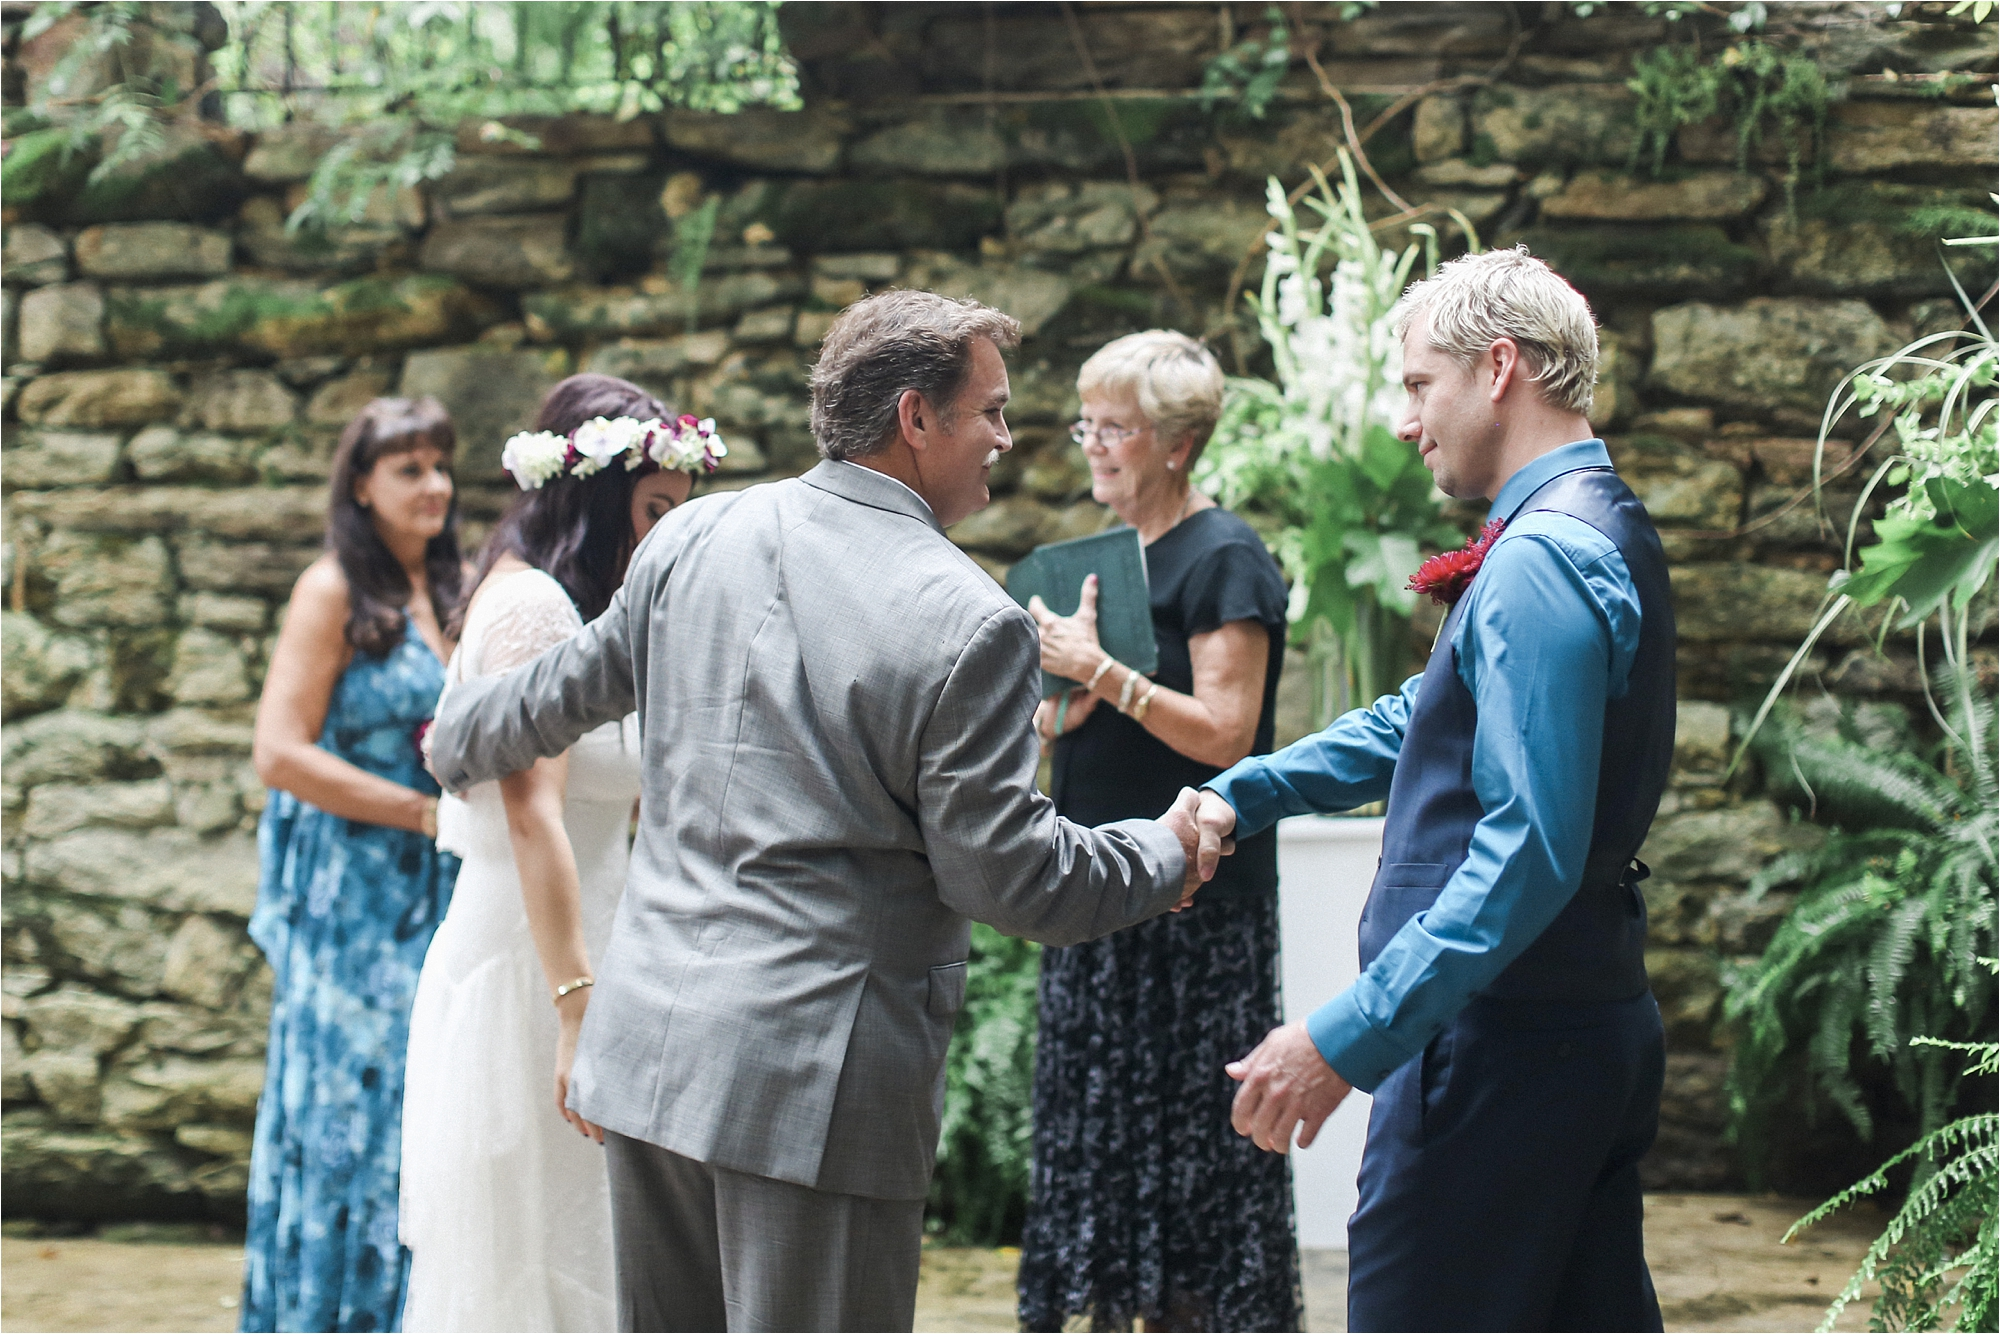 stephanie-yonce-photography-richmond-virginia-bohemian-outdoor-wedding-photo_0016.jpg